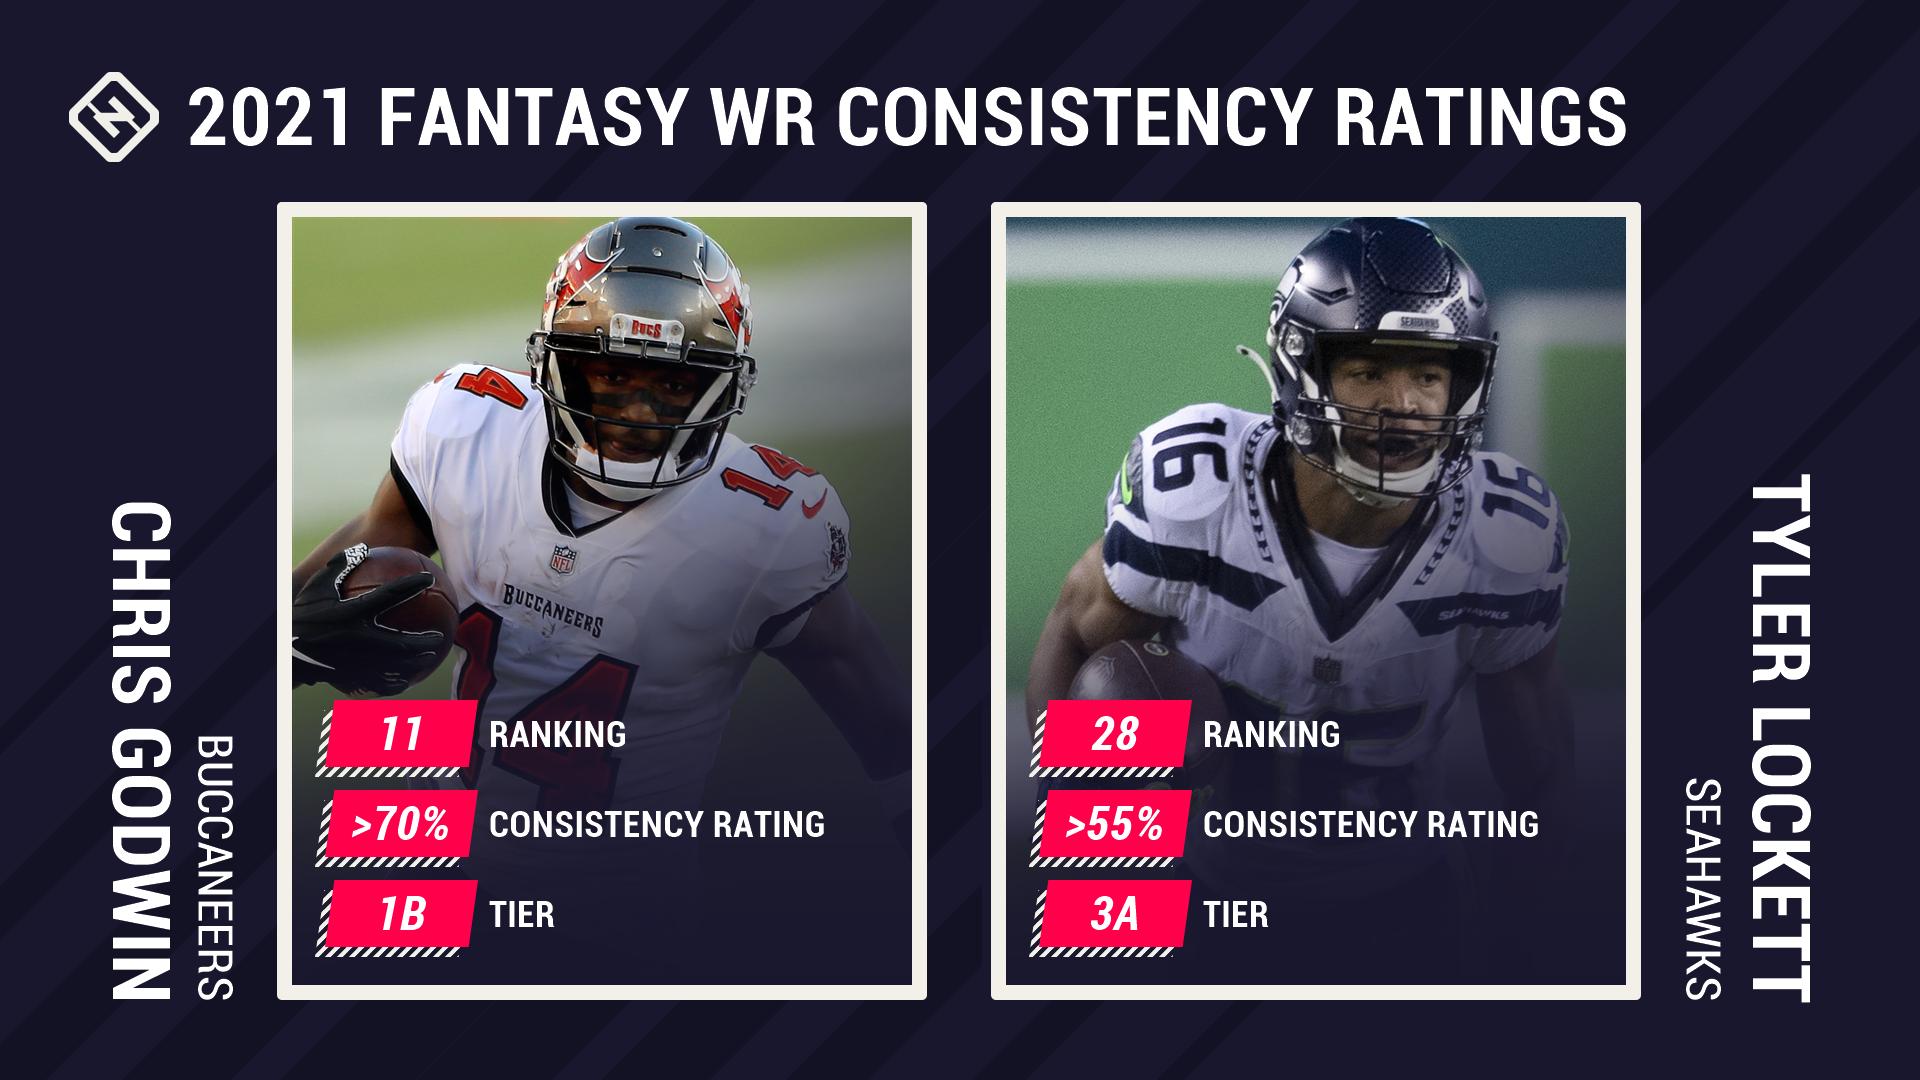 2021 fantasy consistency ratings wr